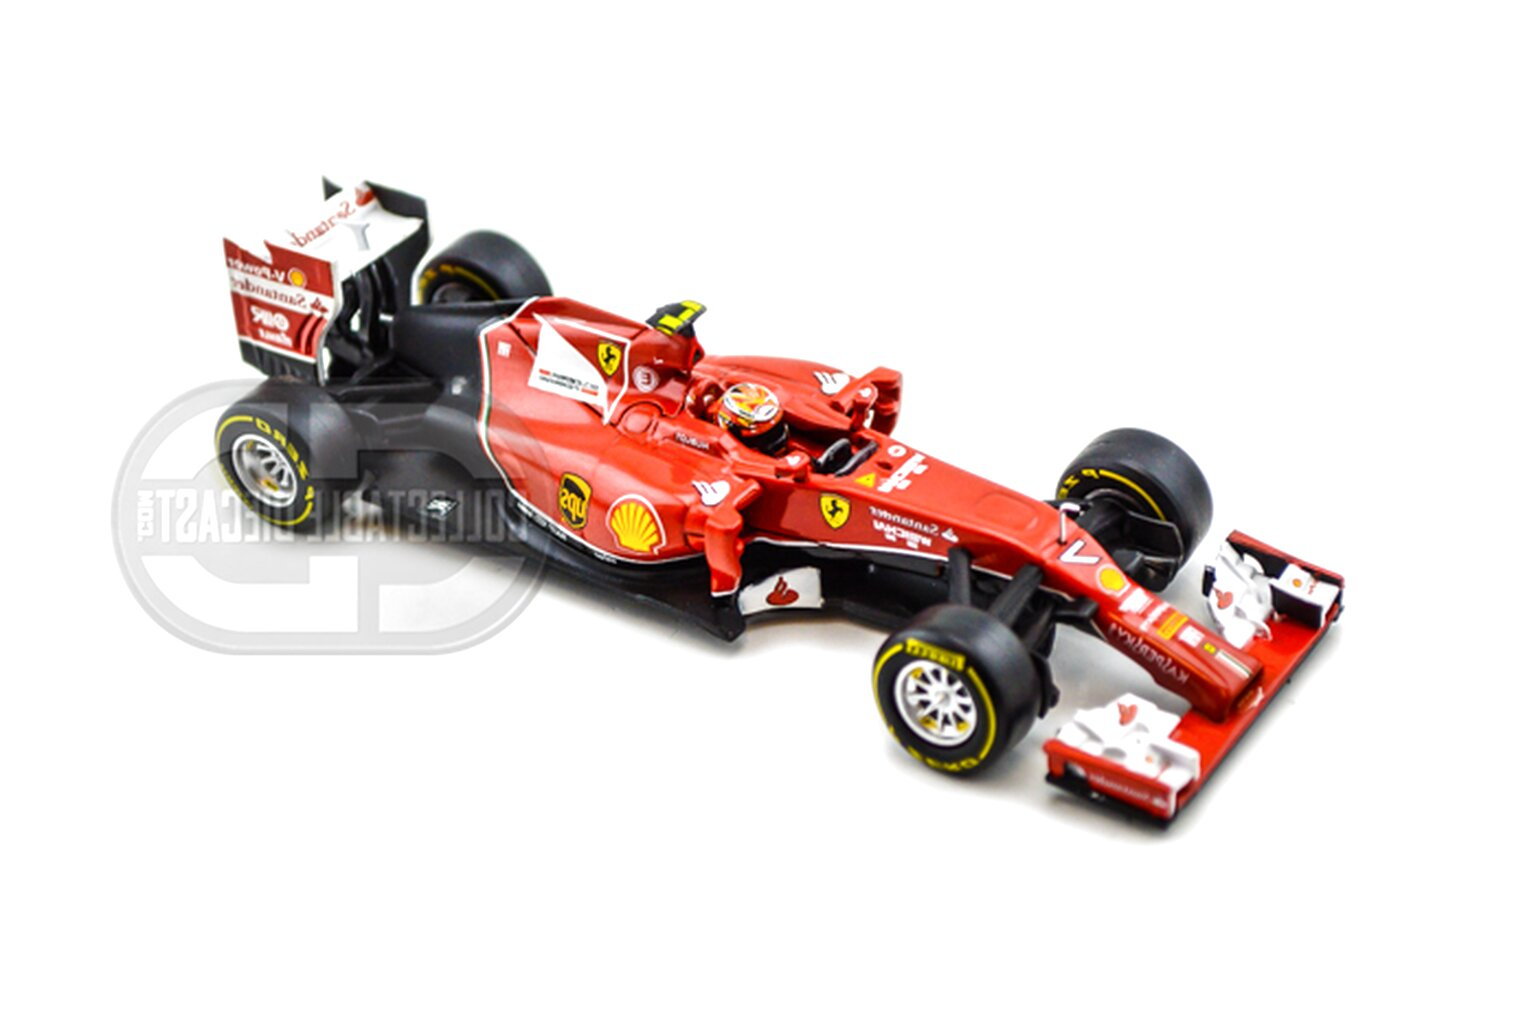 hot wheels formula 1 for sale